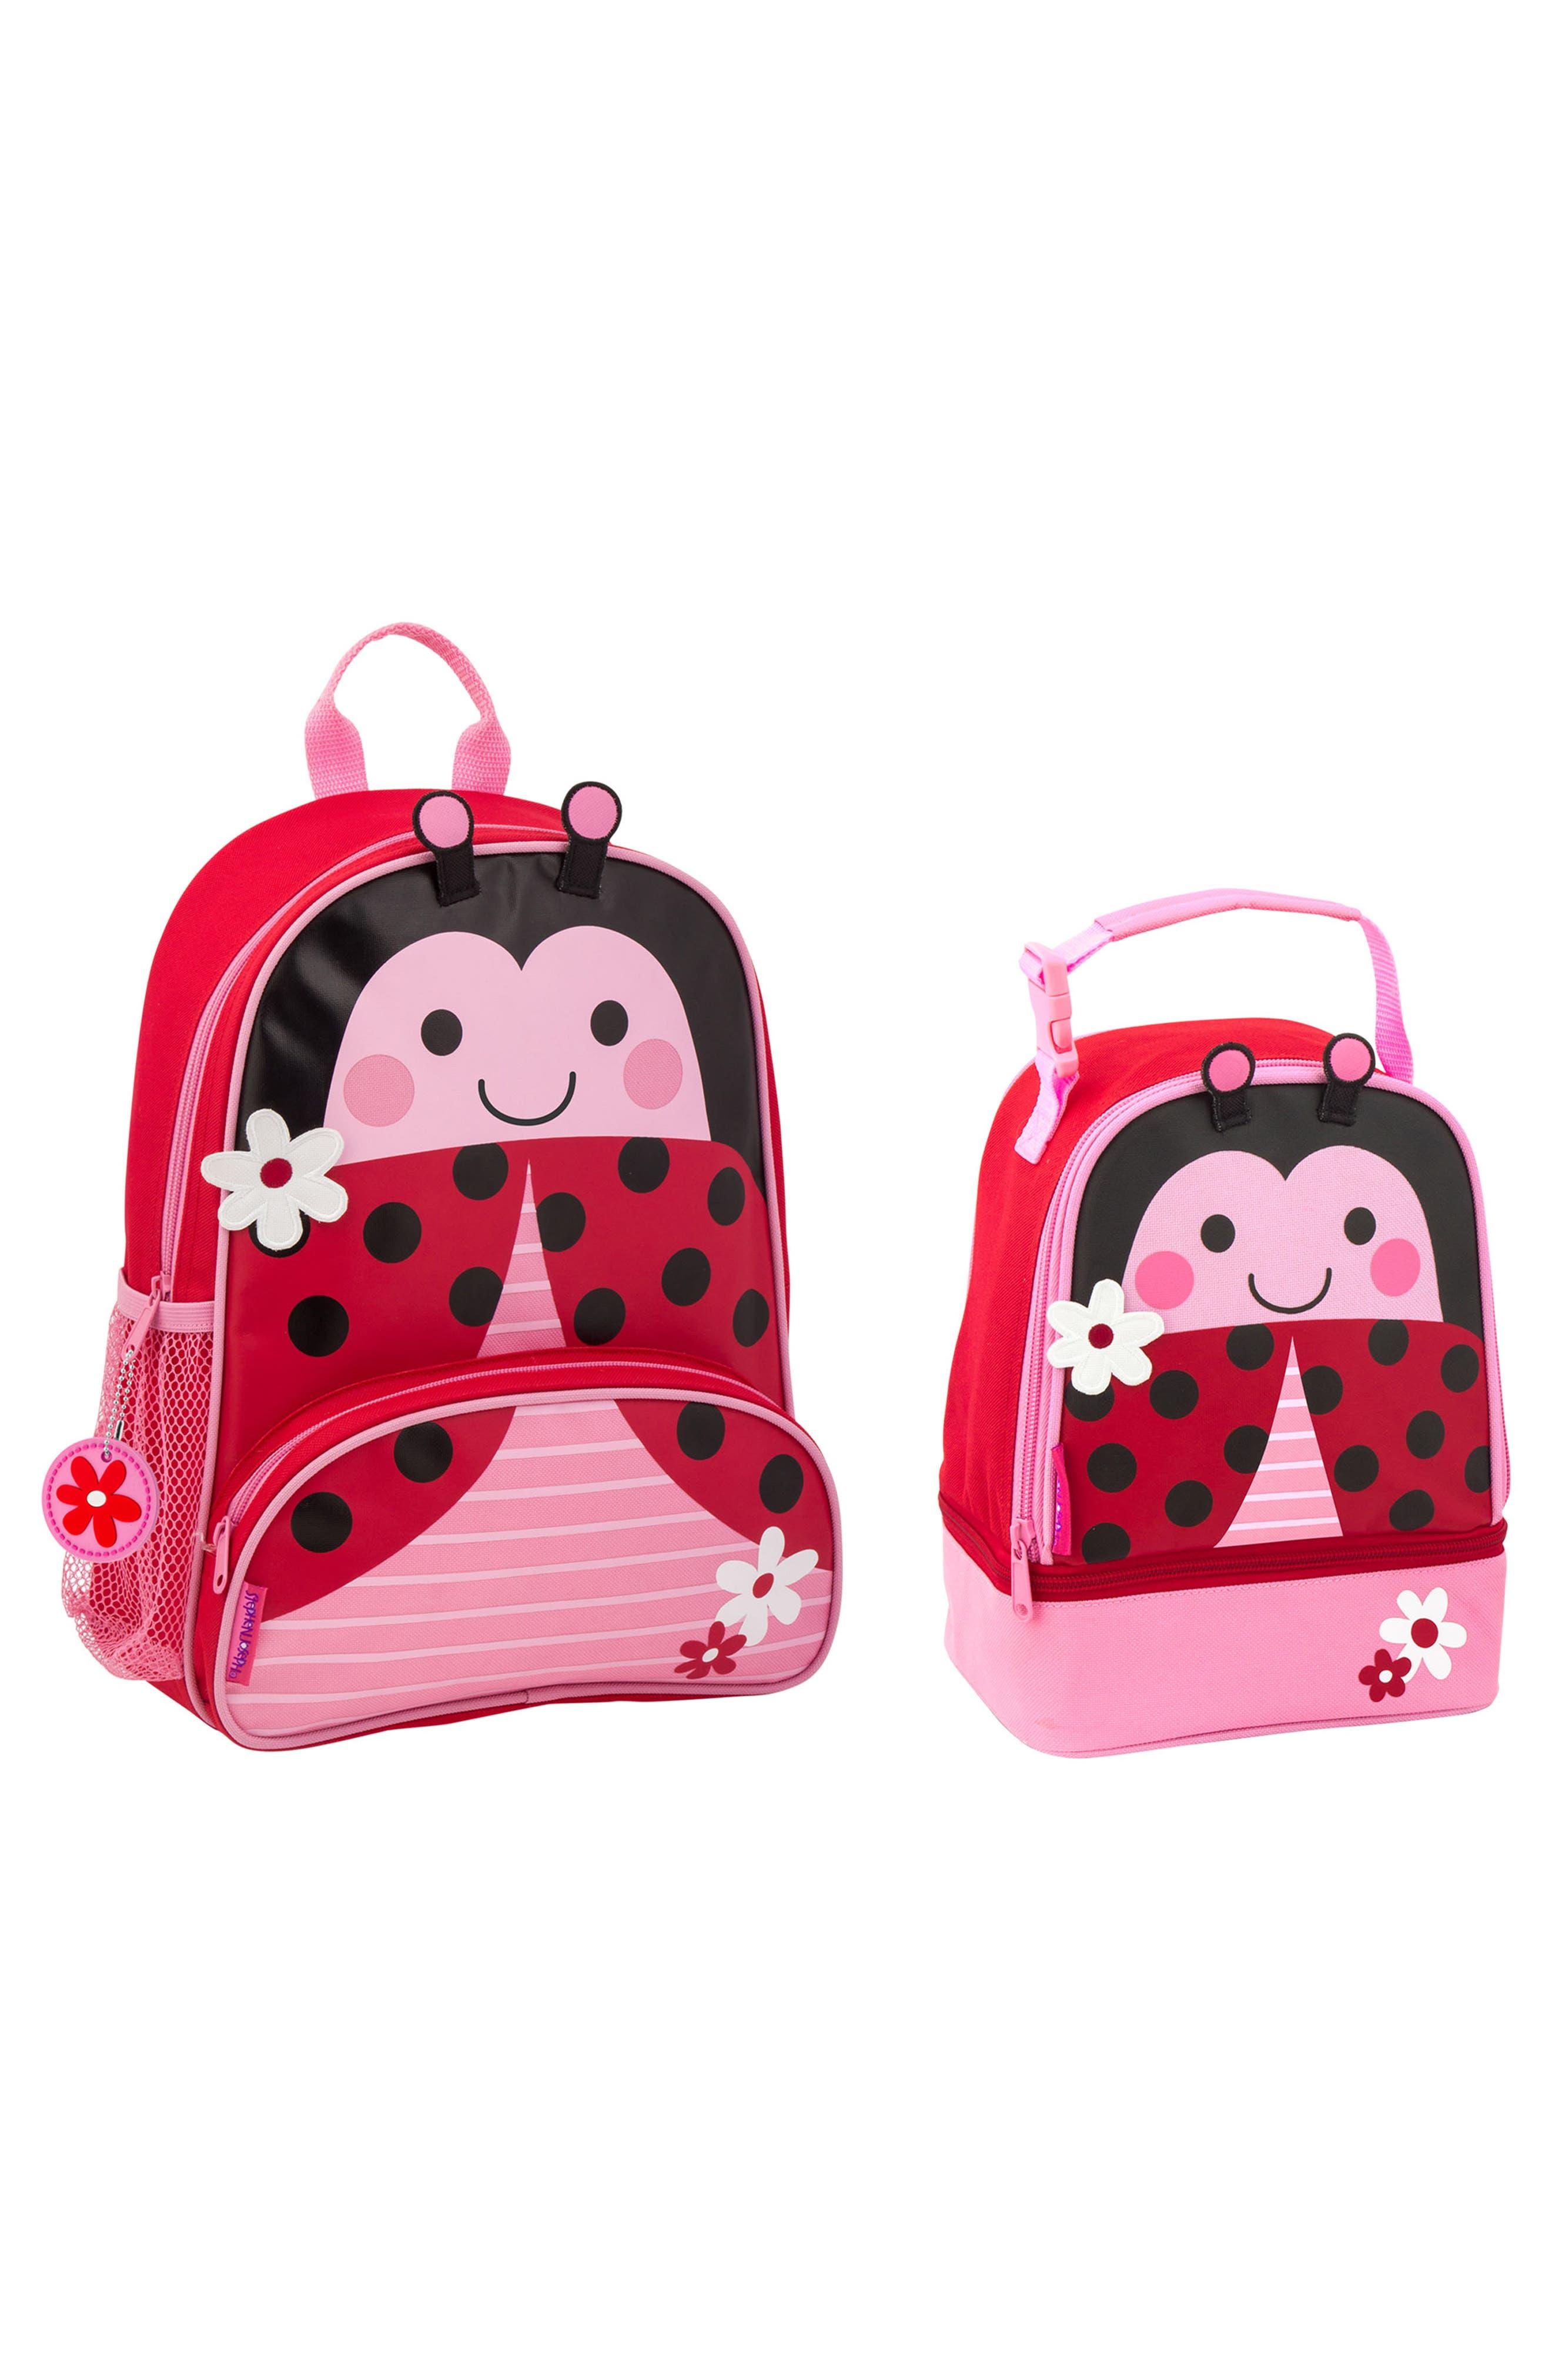 STEPHEN JOSEPH Ladybug Sidekick Backpack & Lunch Pal, Main, color, LADYBUG